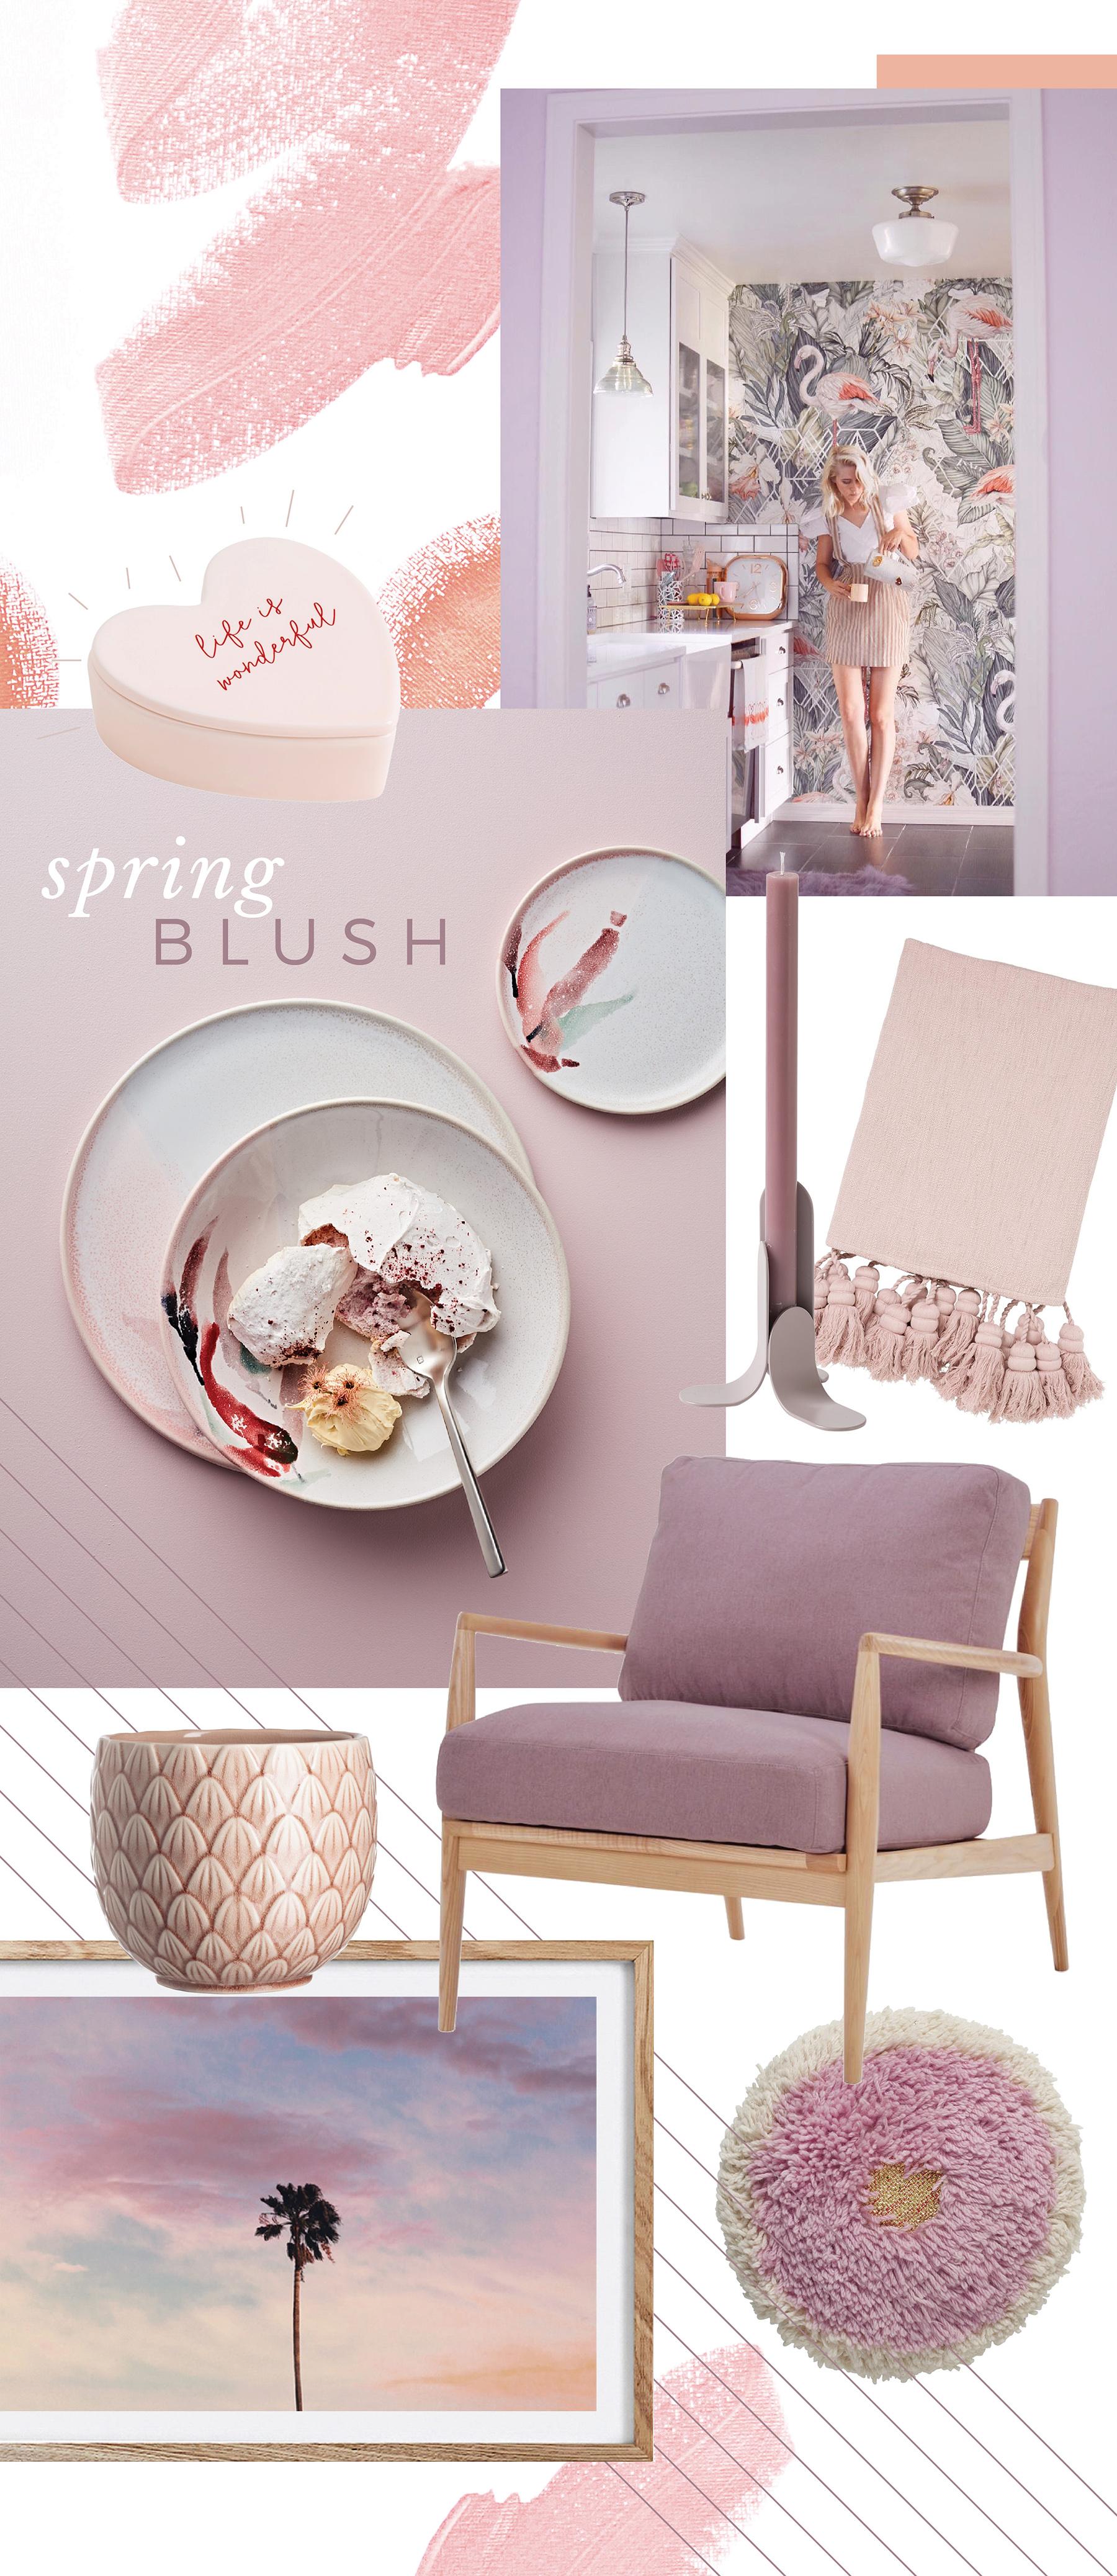 adore_home_blog_colour_trend_spring_blush_pink_lilac_decor.jpg